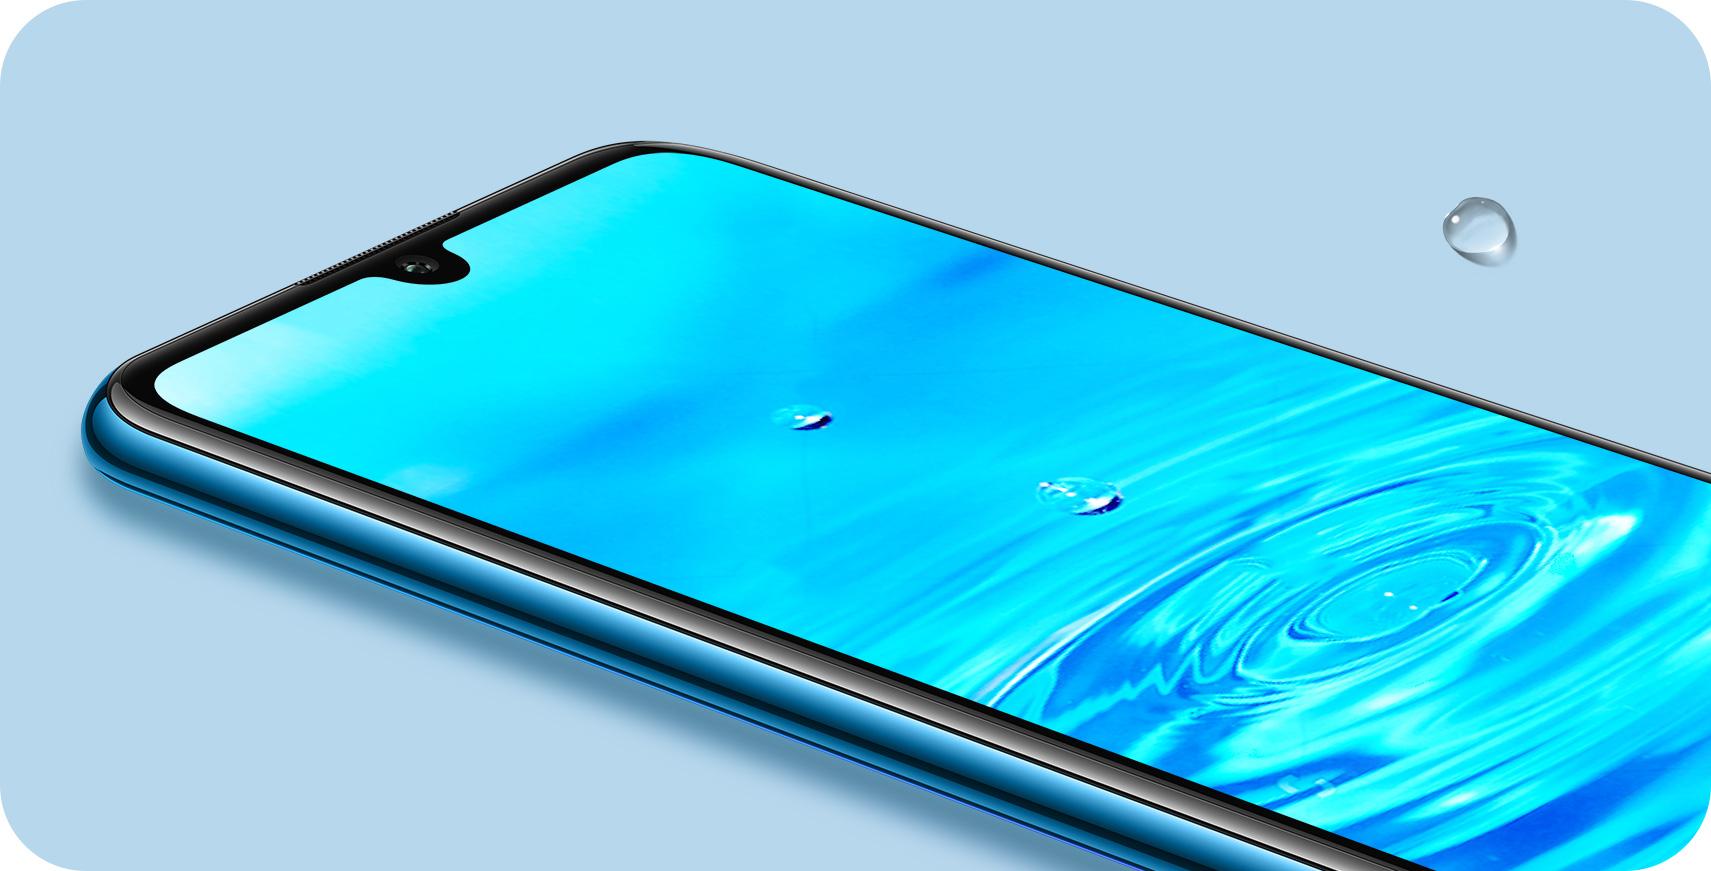 Huawei P30 Lite Dual SIM kártyafüggetlen okostelefon, Midnight Black (Android) 06